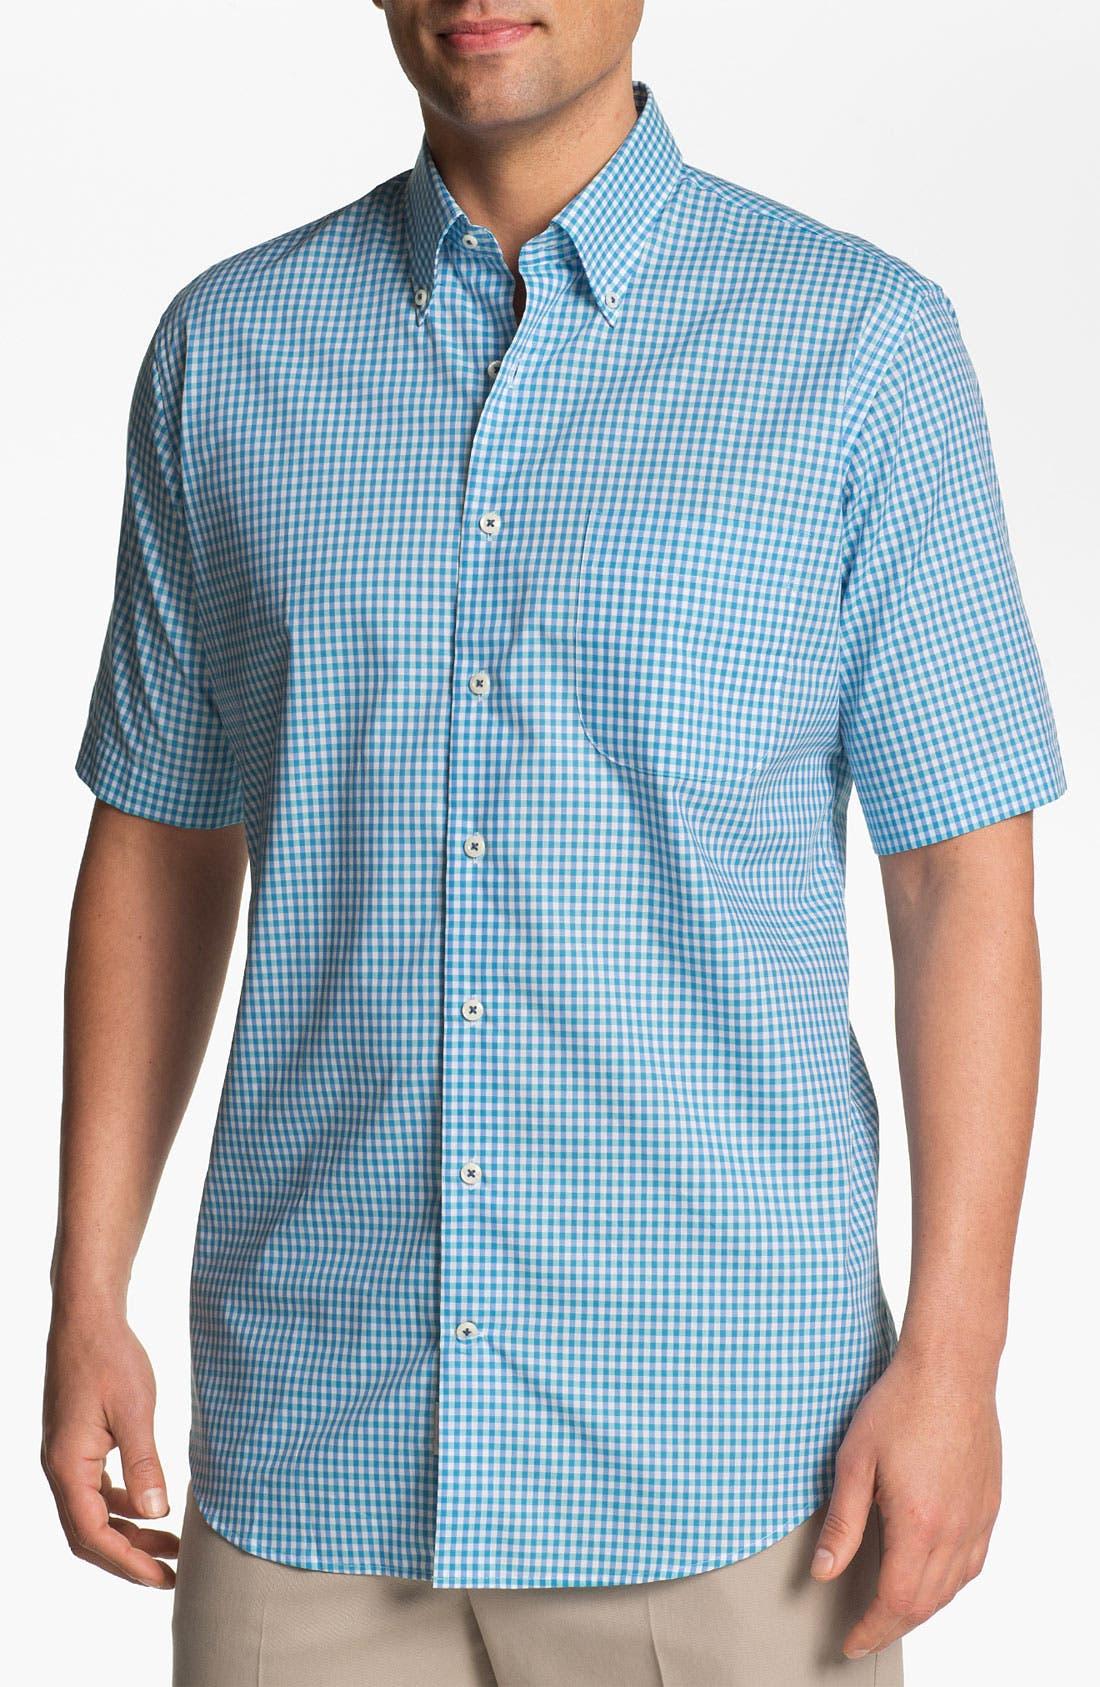 Main Image - Peter Millar Regular Fit Short Sleeve Sport Shirt